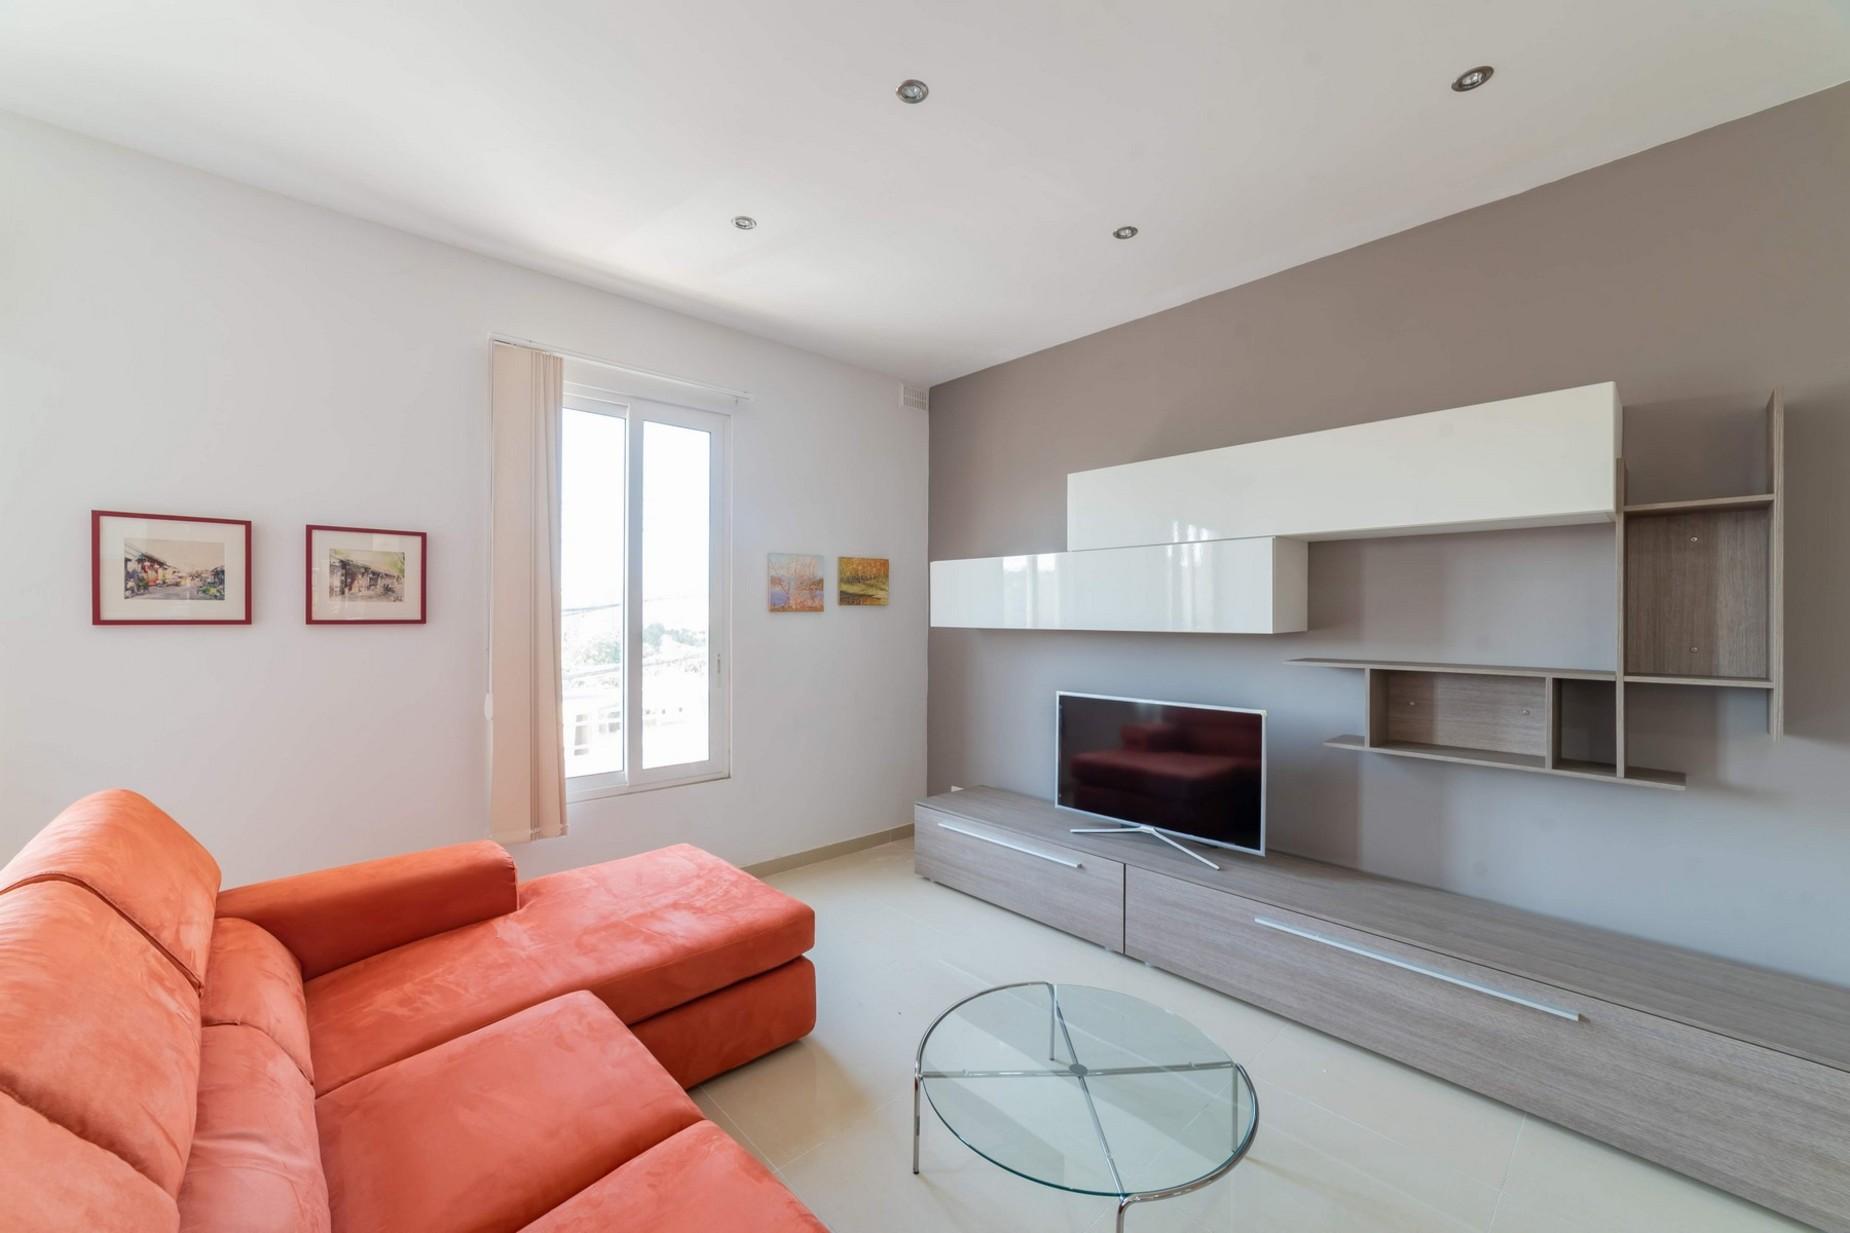 3 bed Apartment For Rent in Balzan, Balzan - thumb 4